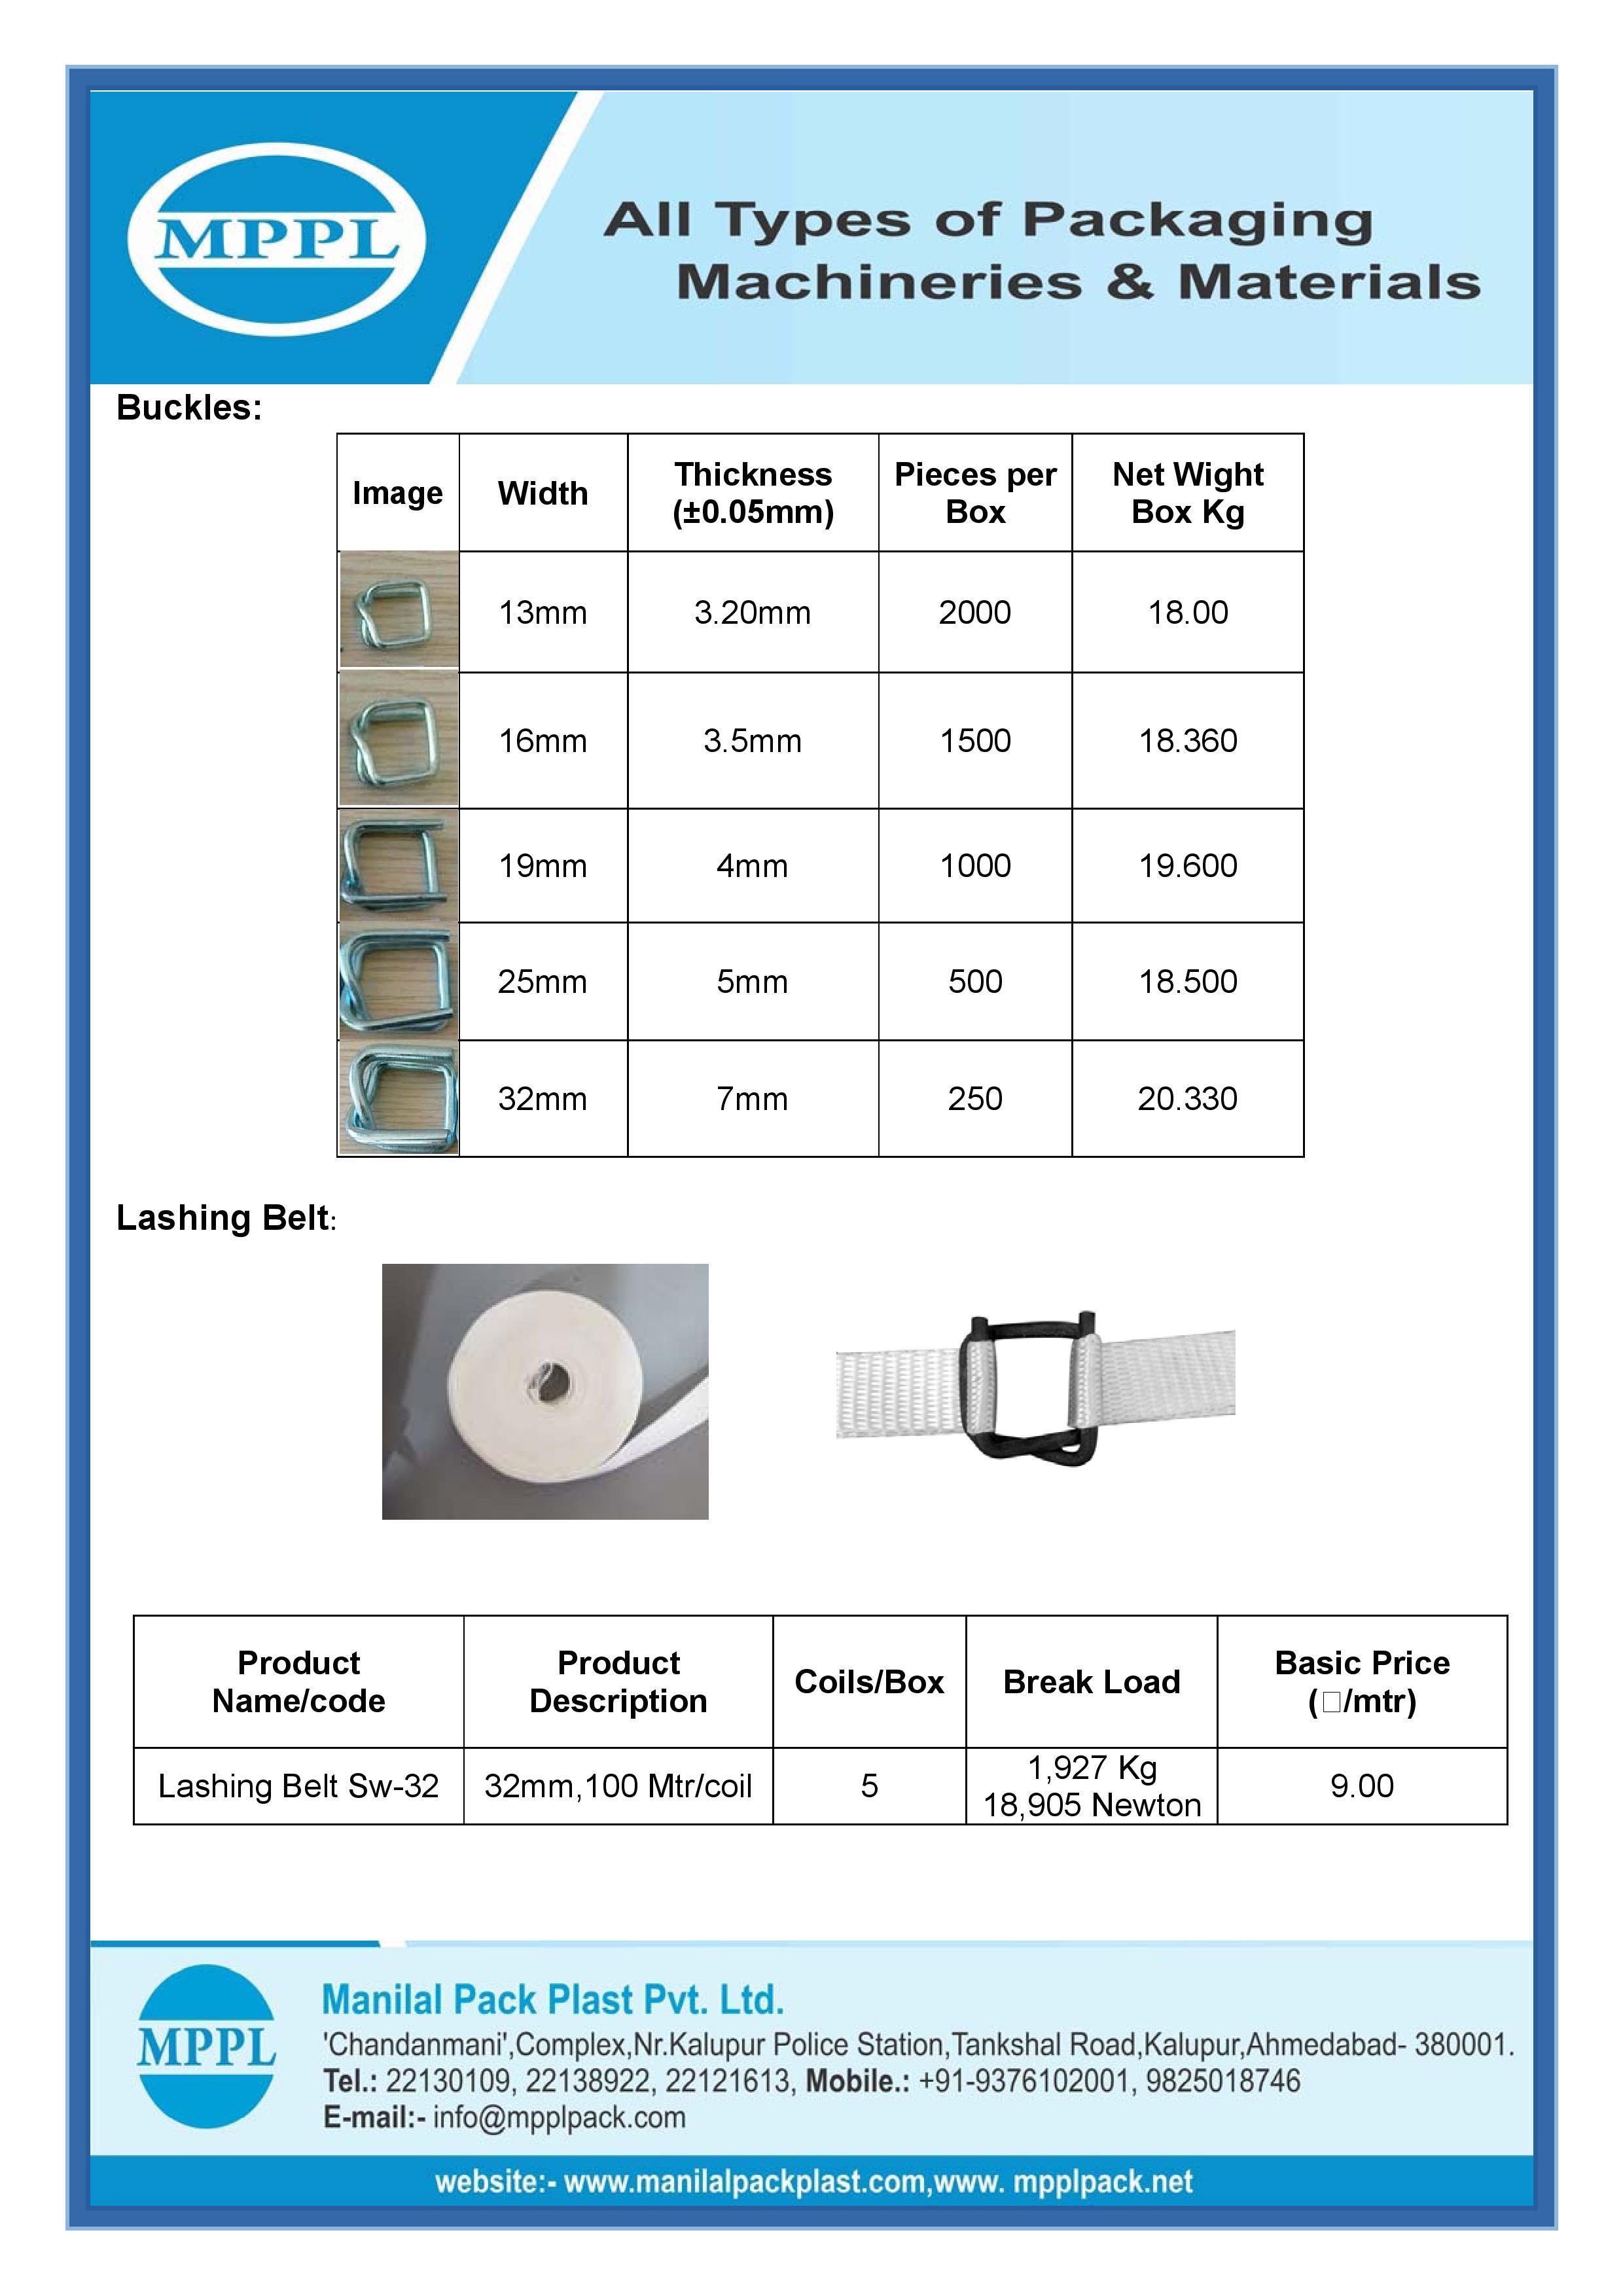 Cord Strap, Buckles & Accessories